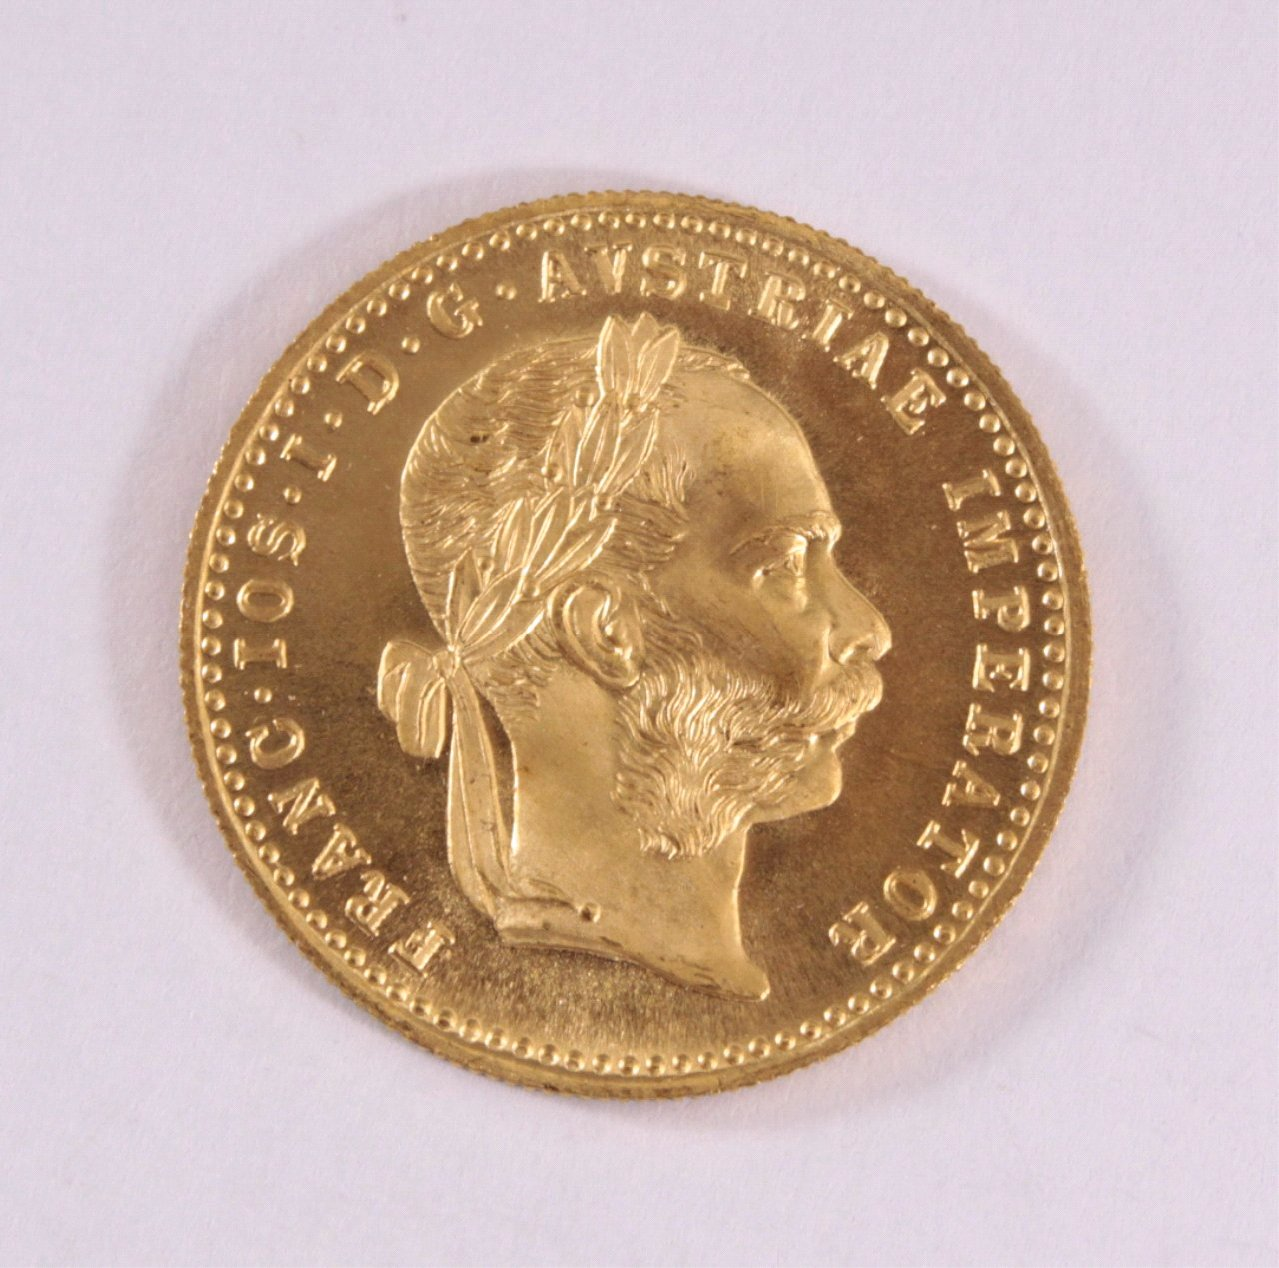 1 Golddukat Kaiser Franz Joseph 1915 Badisches Auktionshaus